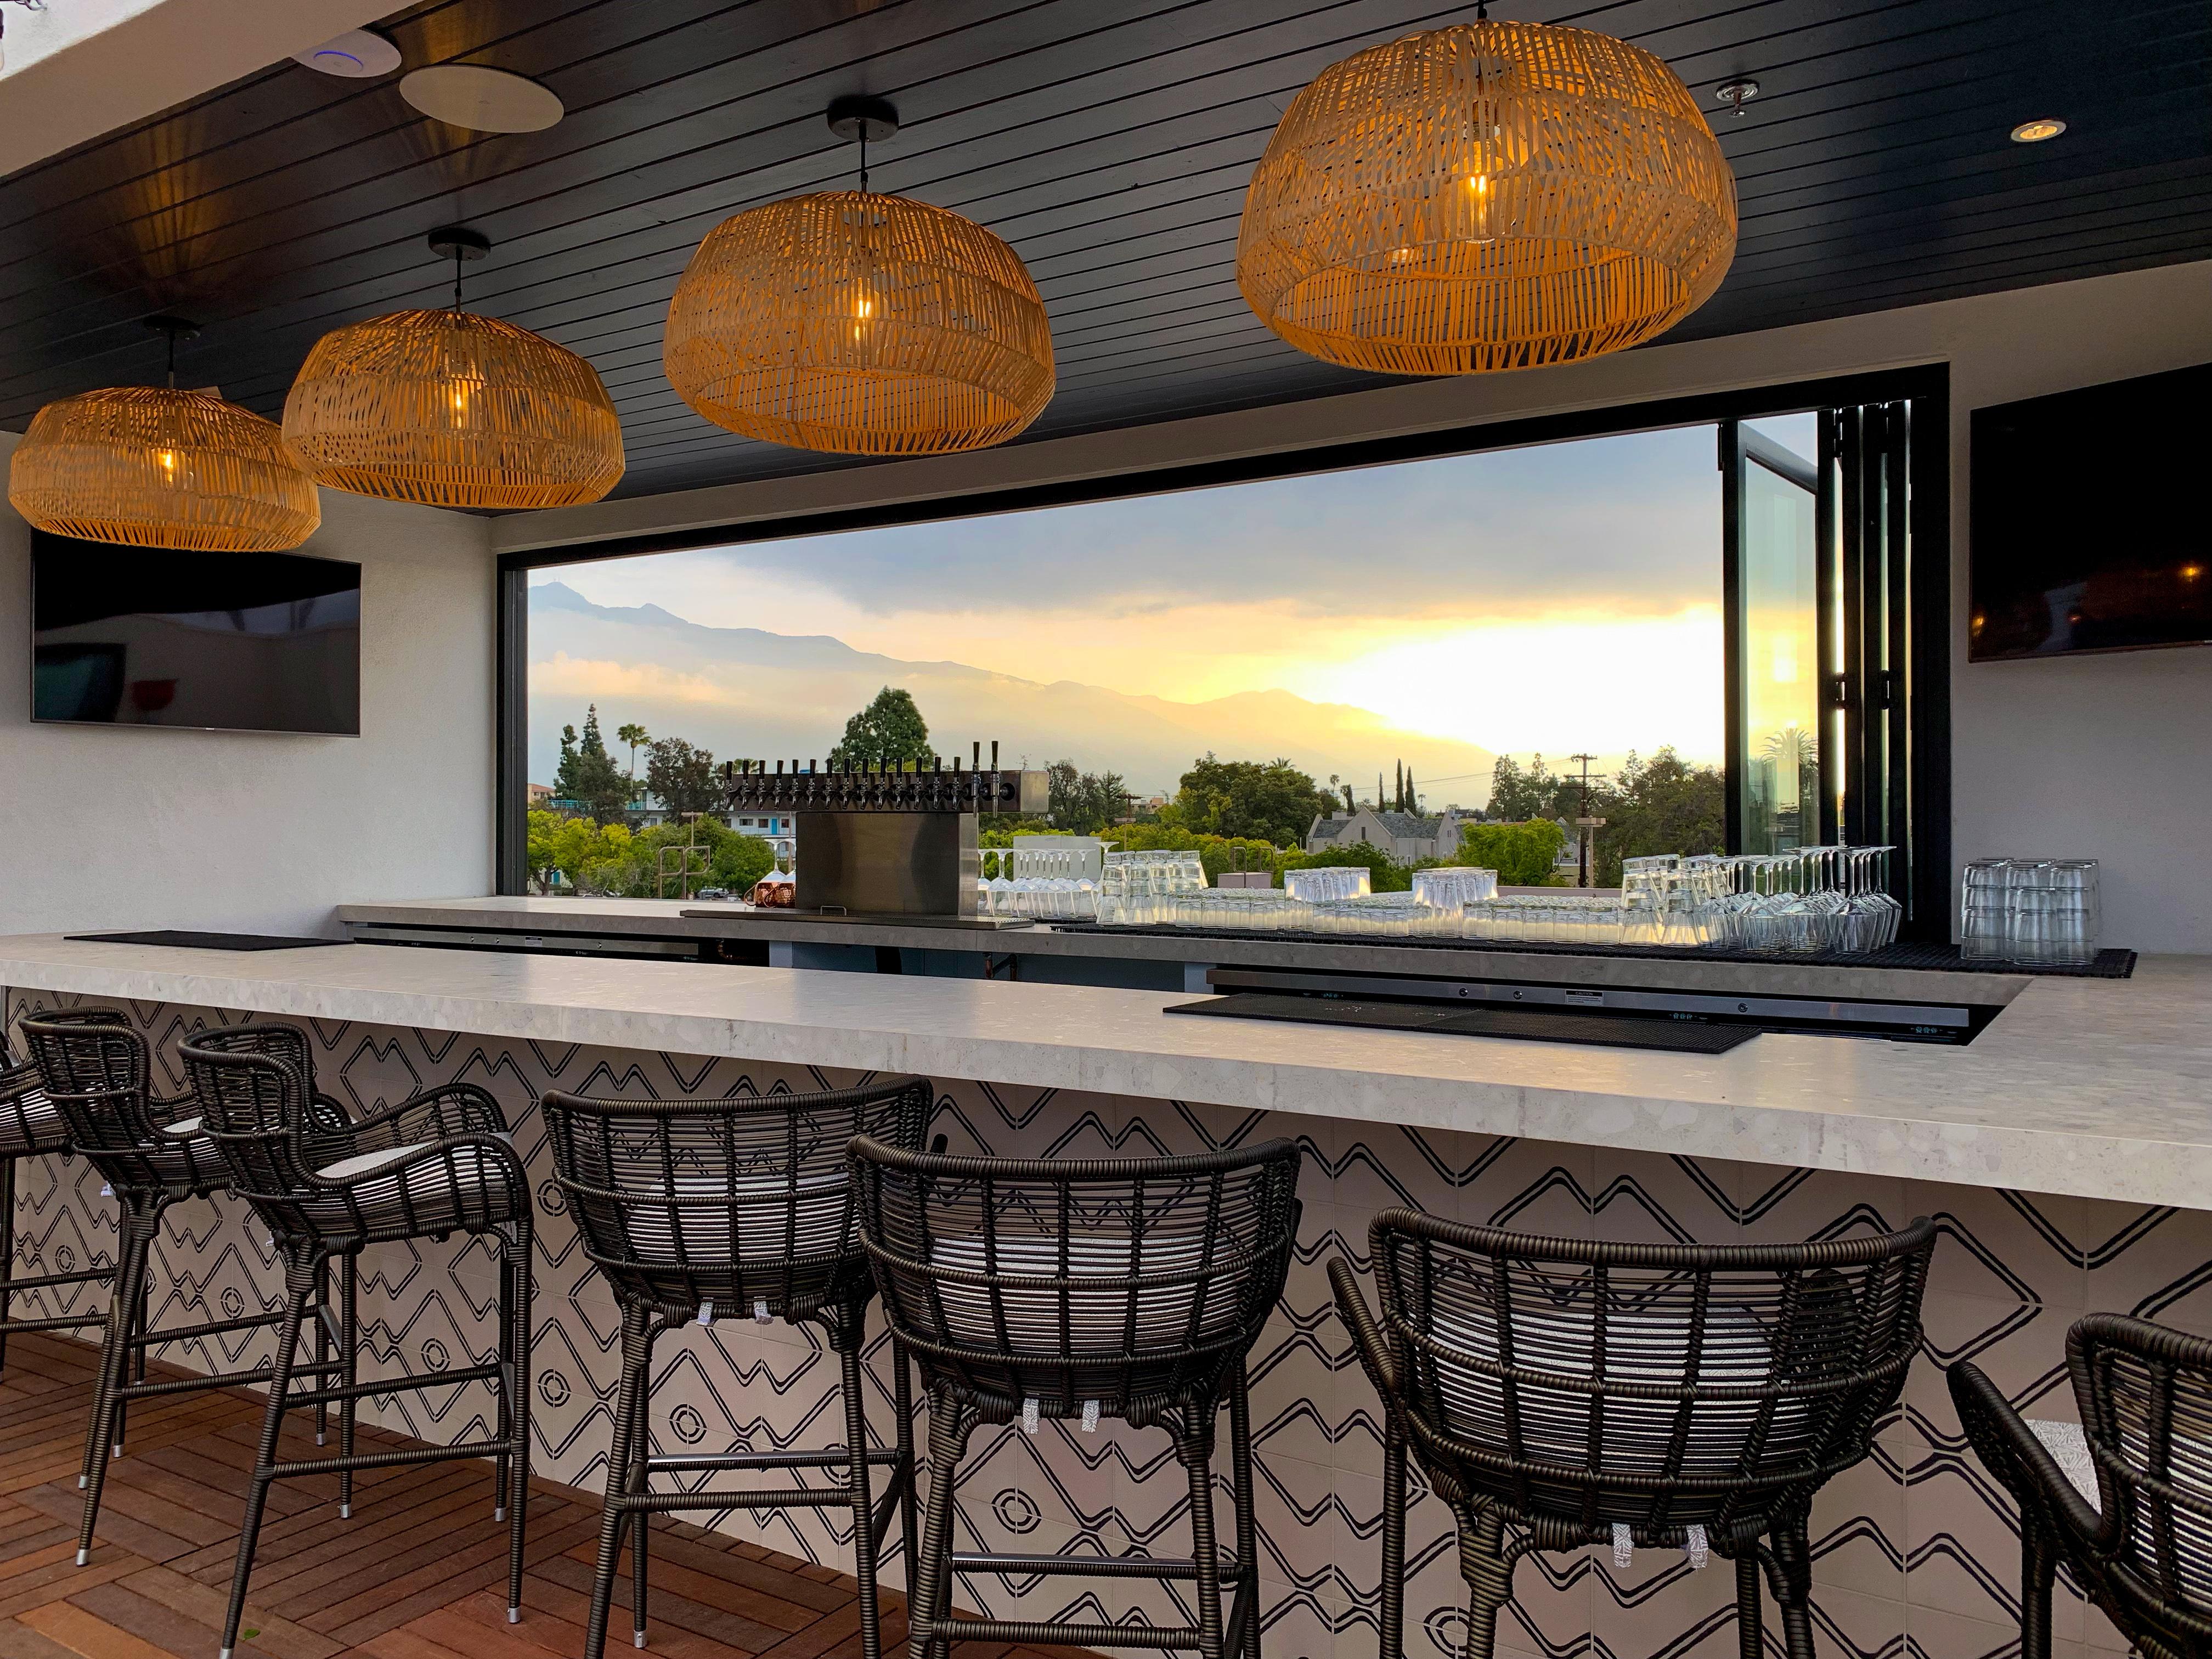 5 Best Outdoor Patio Bars in Pasadena for Summer on Backyard Bar id=79596